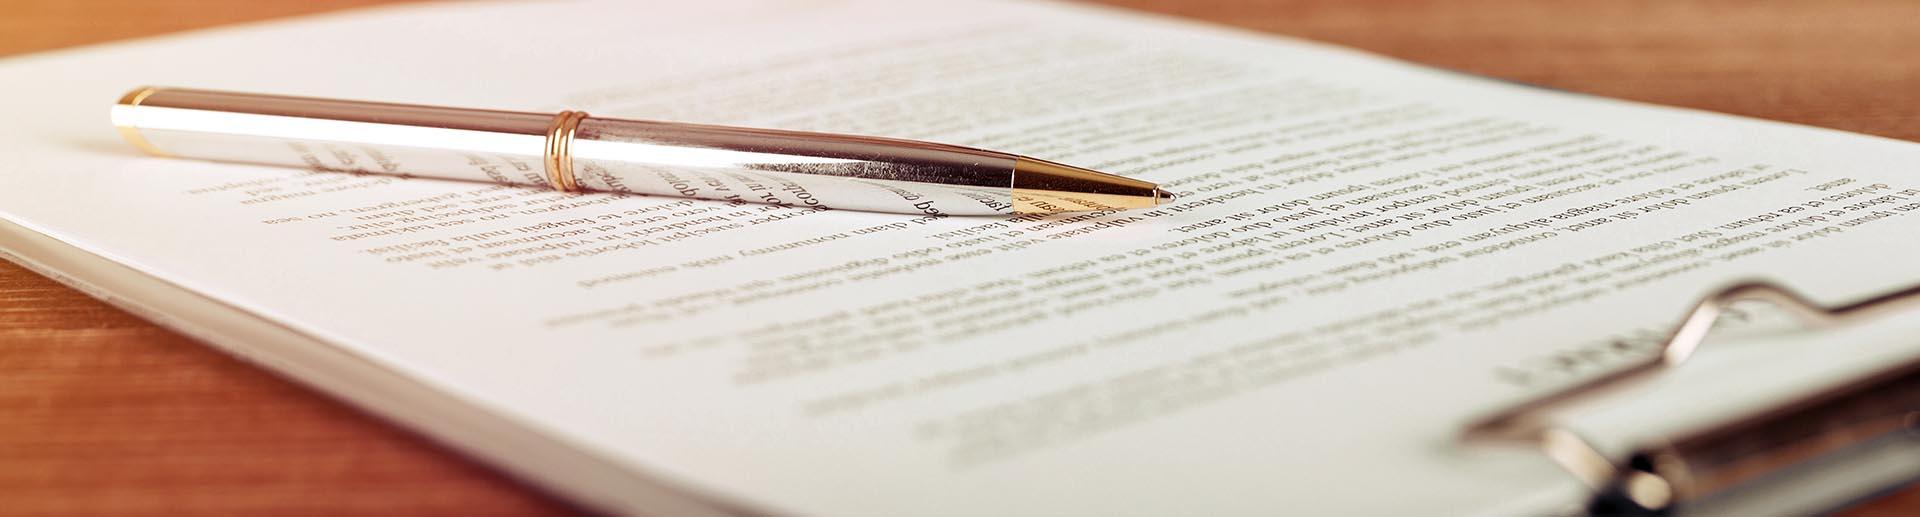 Personalwesen Arbeitsvertrag